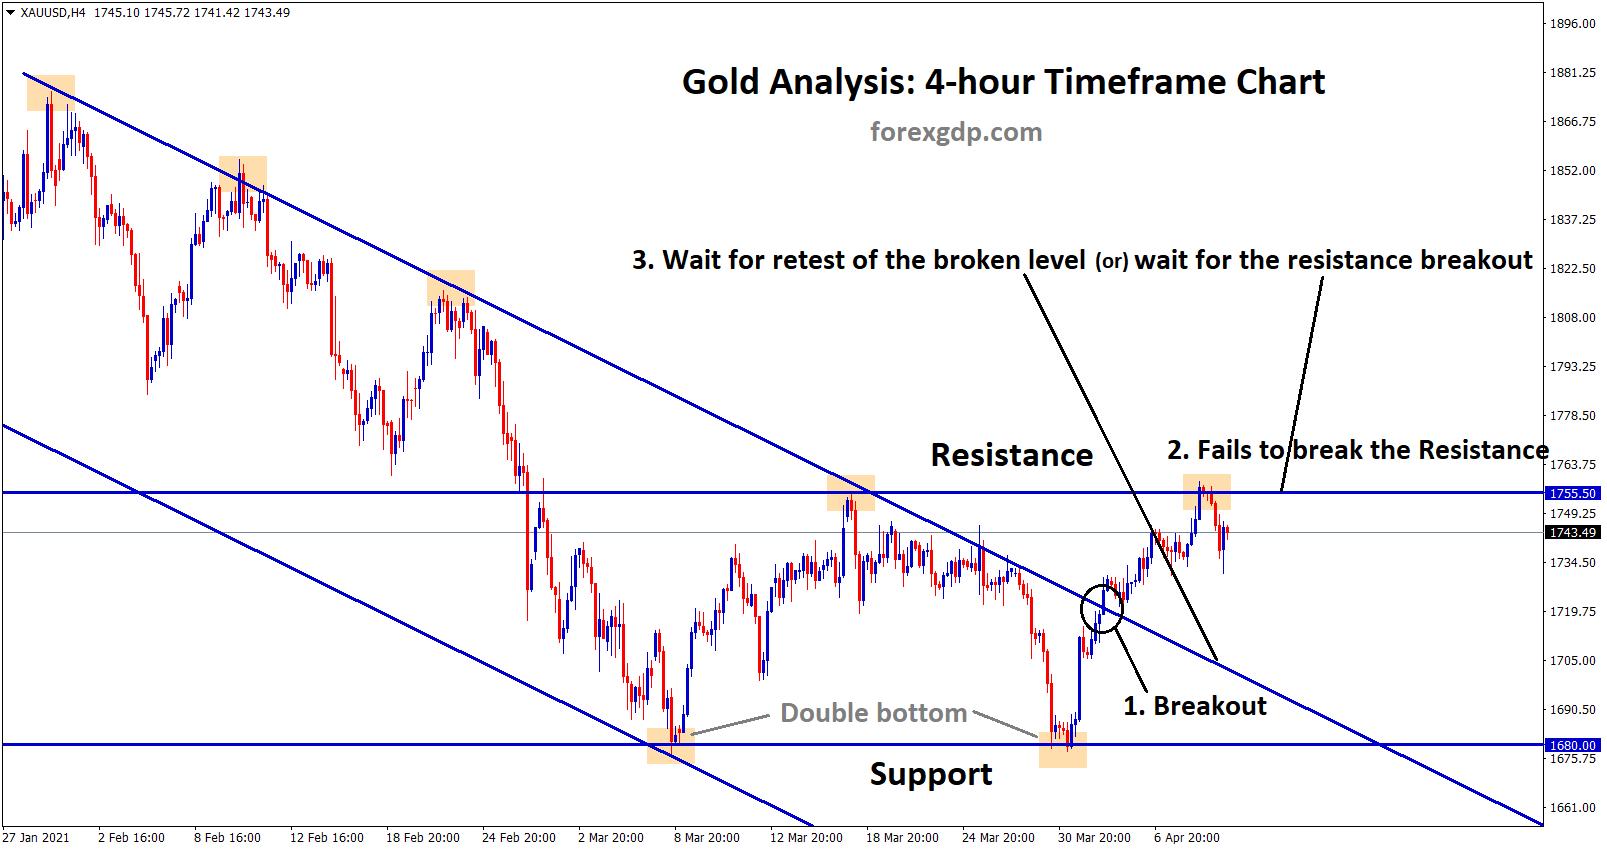 Gold breakout retest may happen or resistance will break